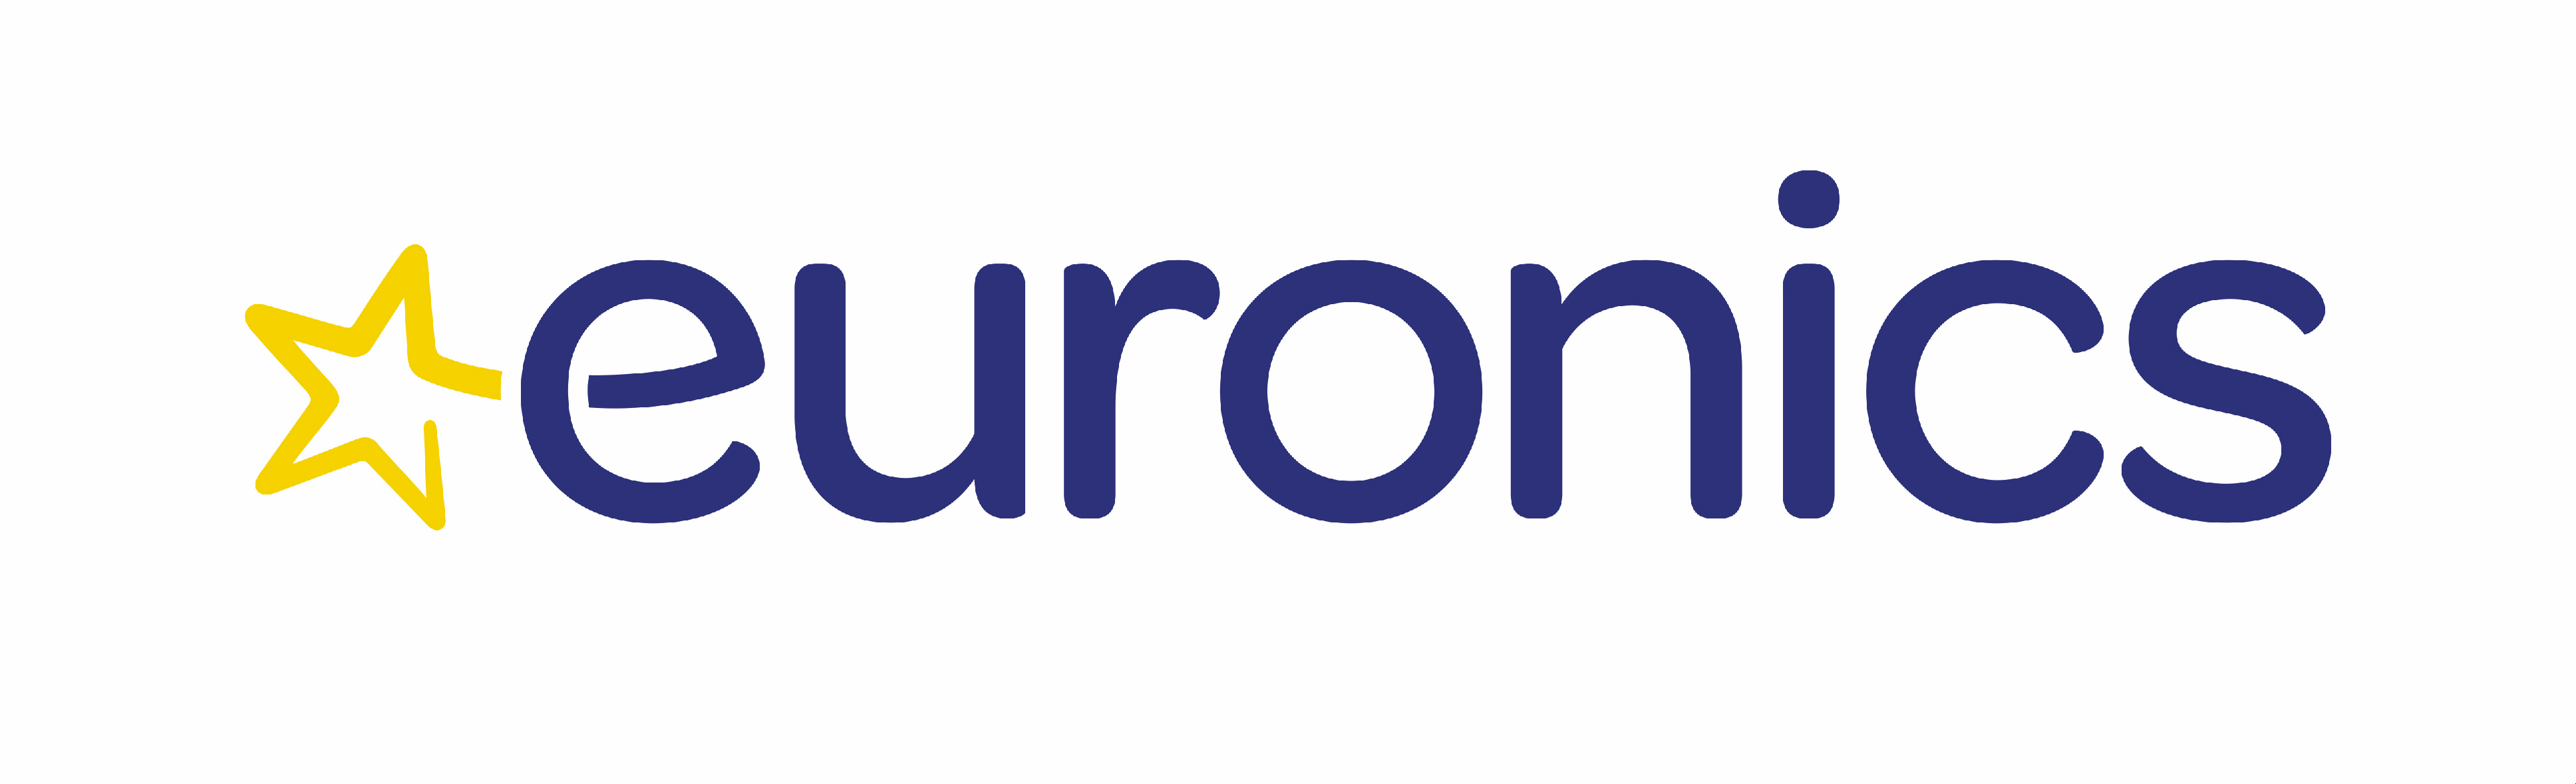 Euronics.co.uk